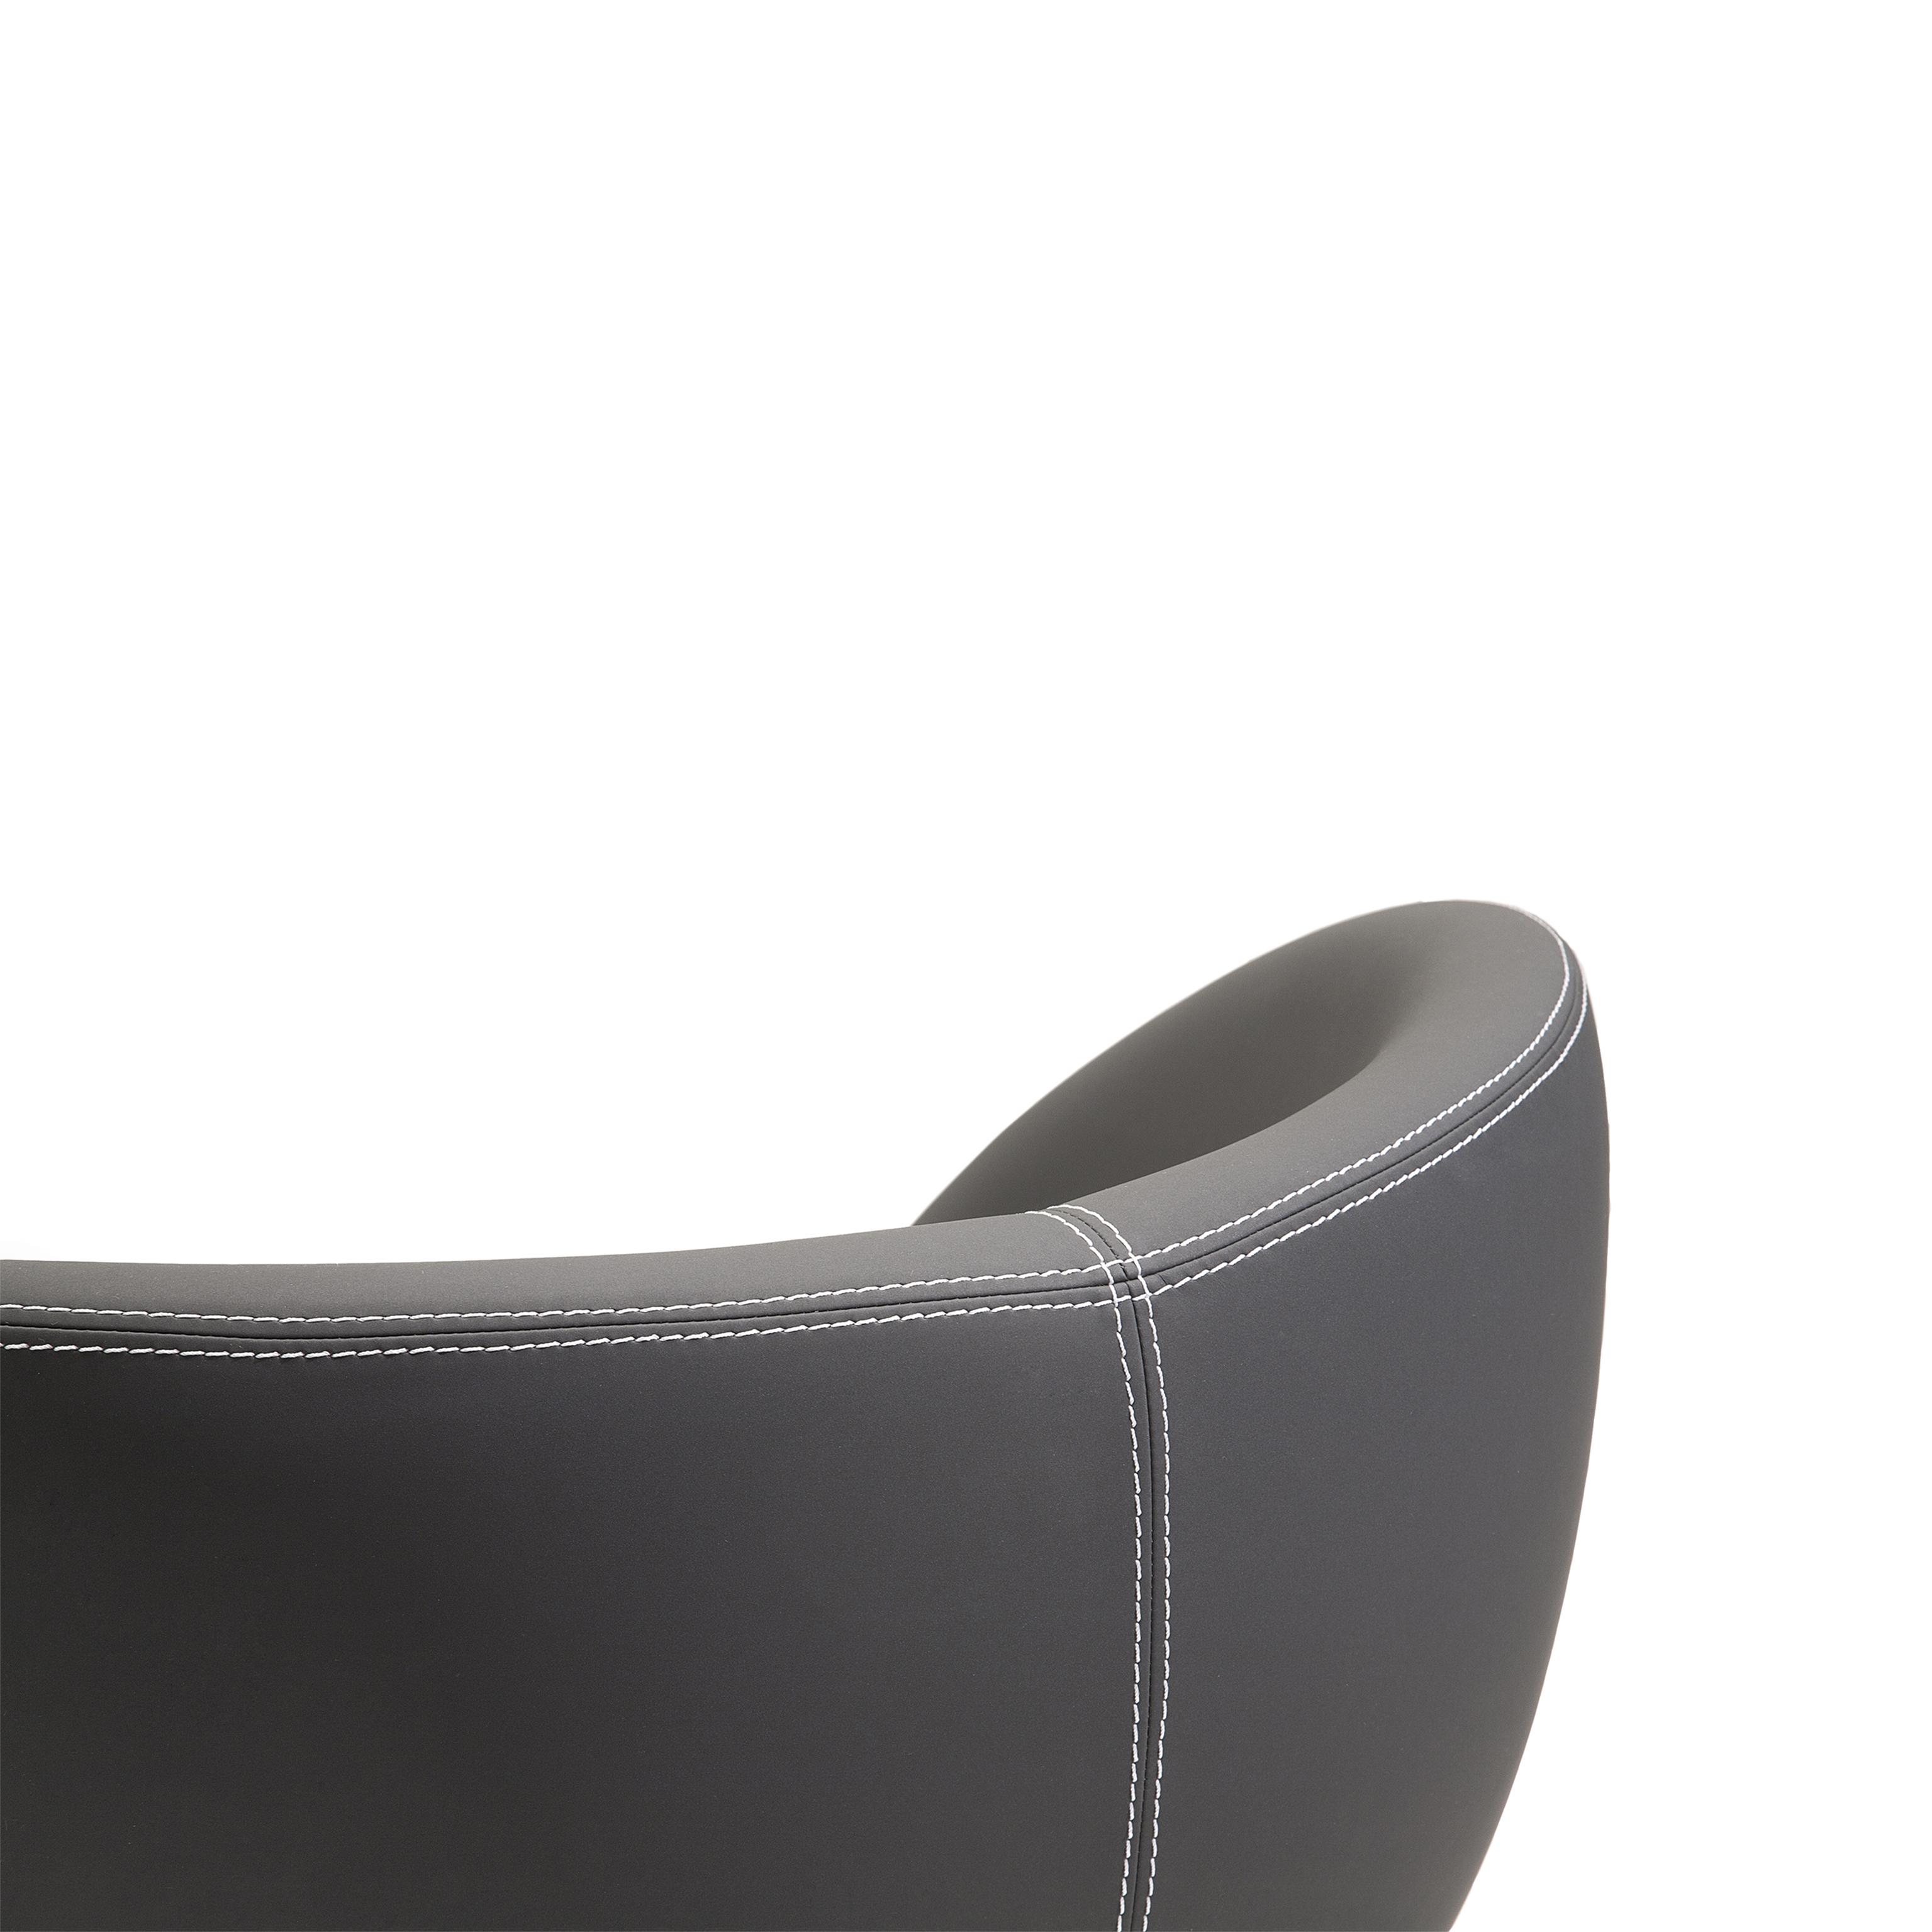 Planet stol detalj kontrassøm Fora Form